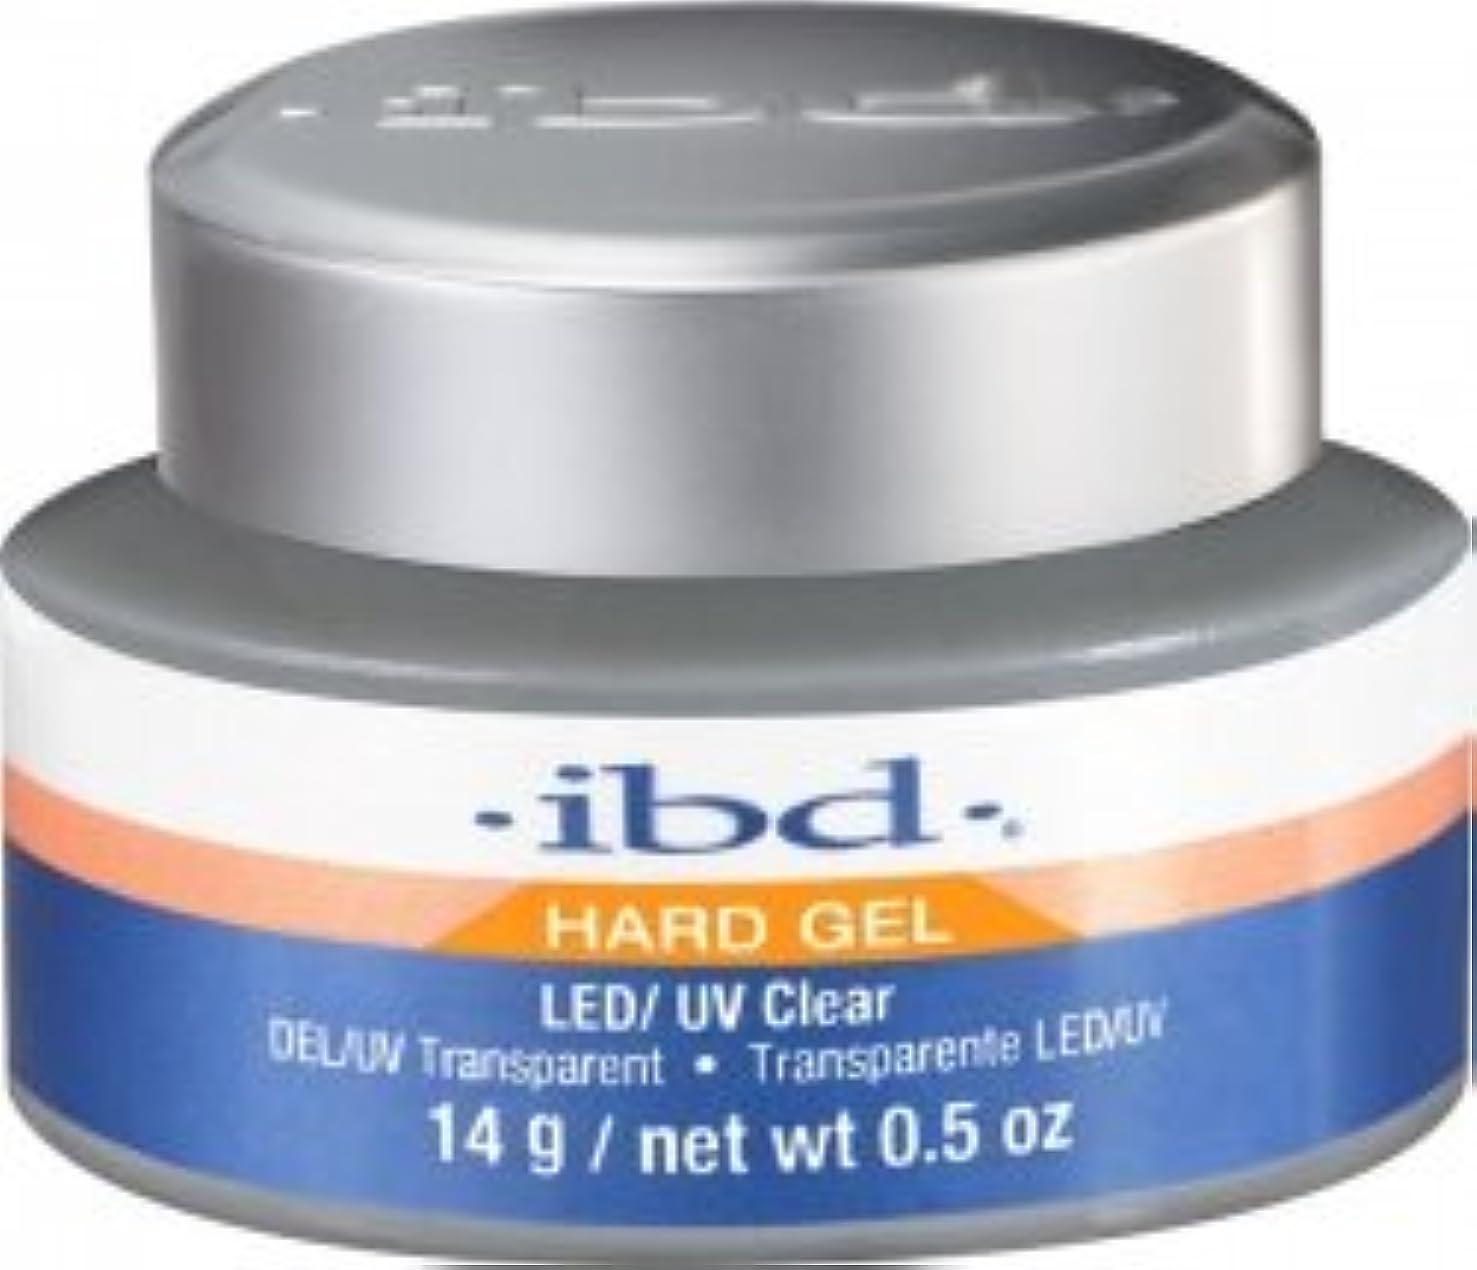 IBD LED/UV Clear Gel - .5oz 14g [並行輸入品]